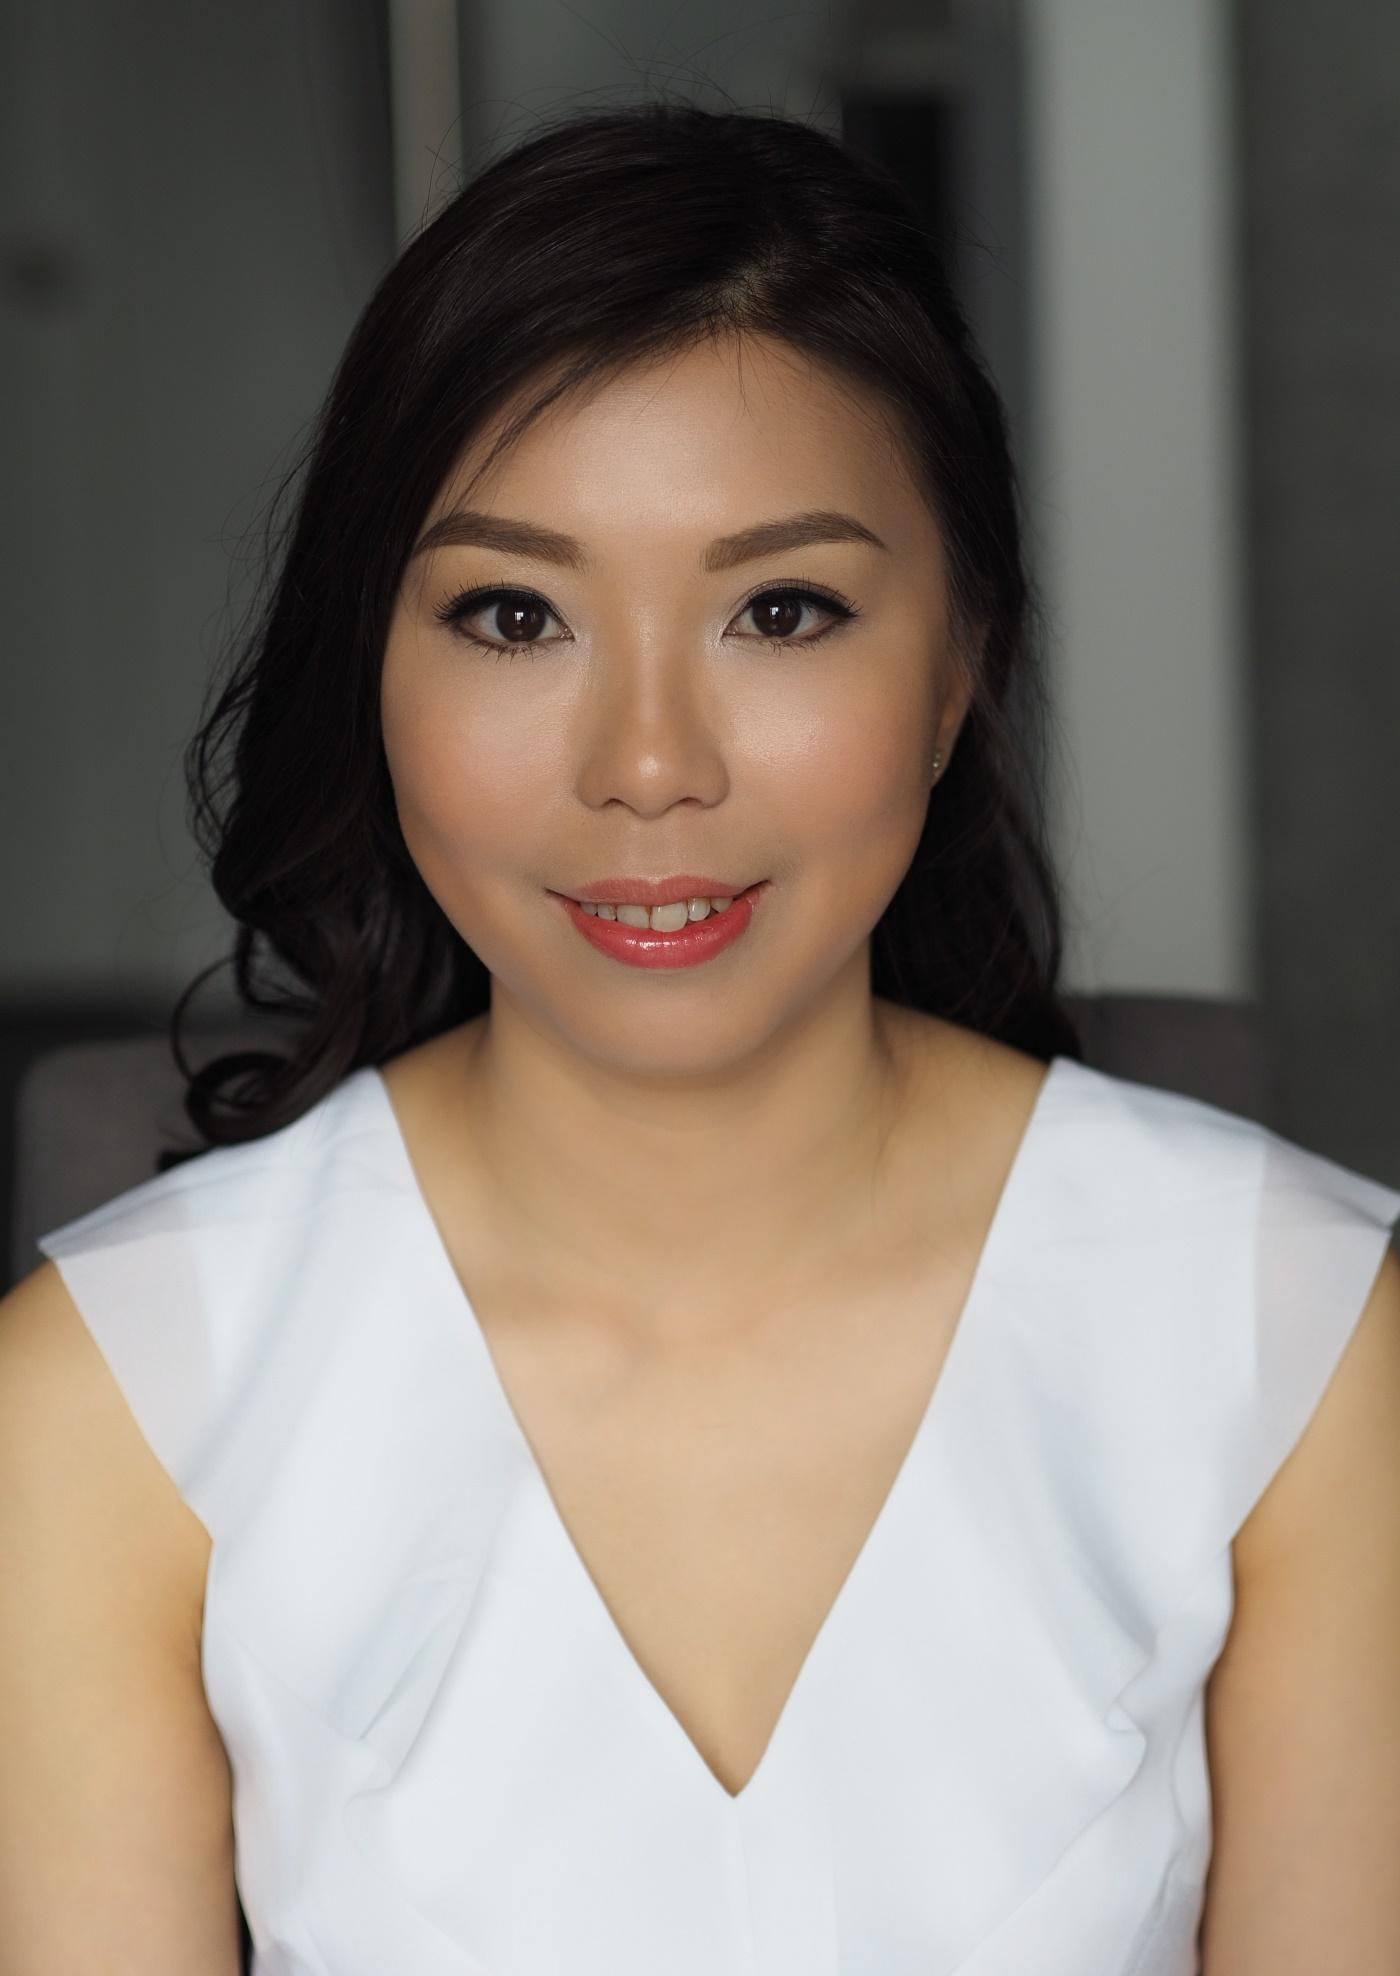 Toronto Markham Chinese wedding makeup artist